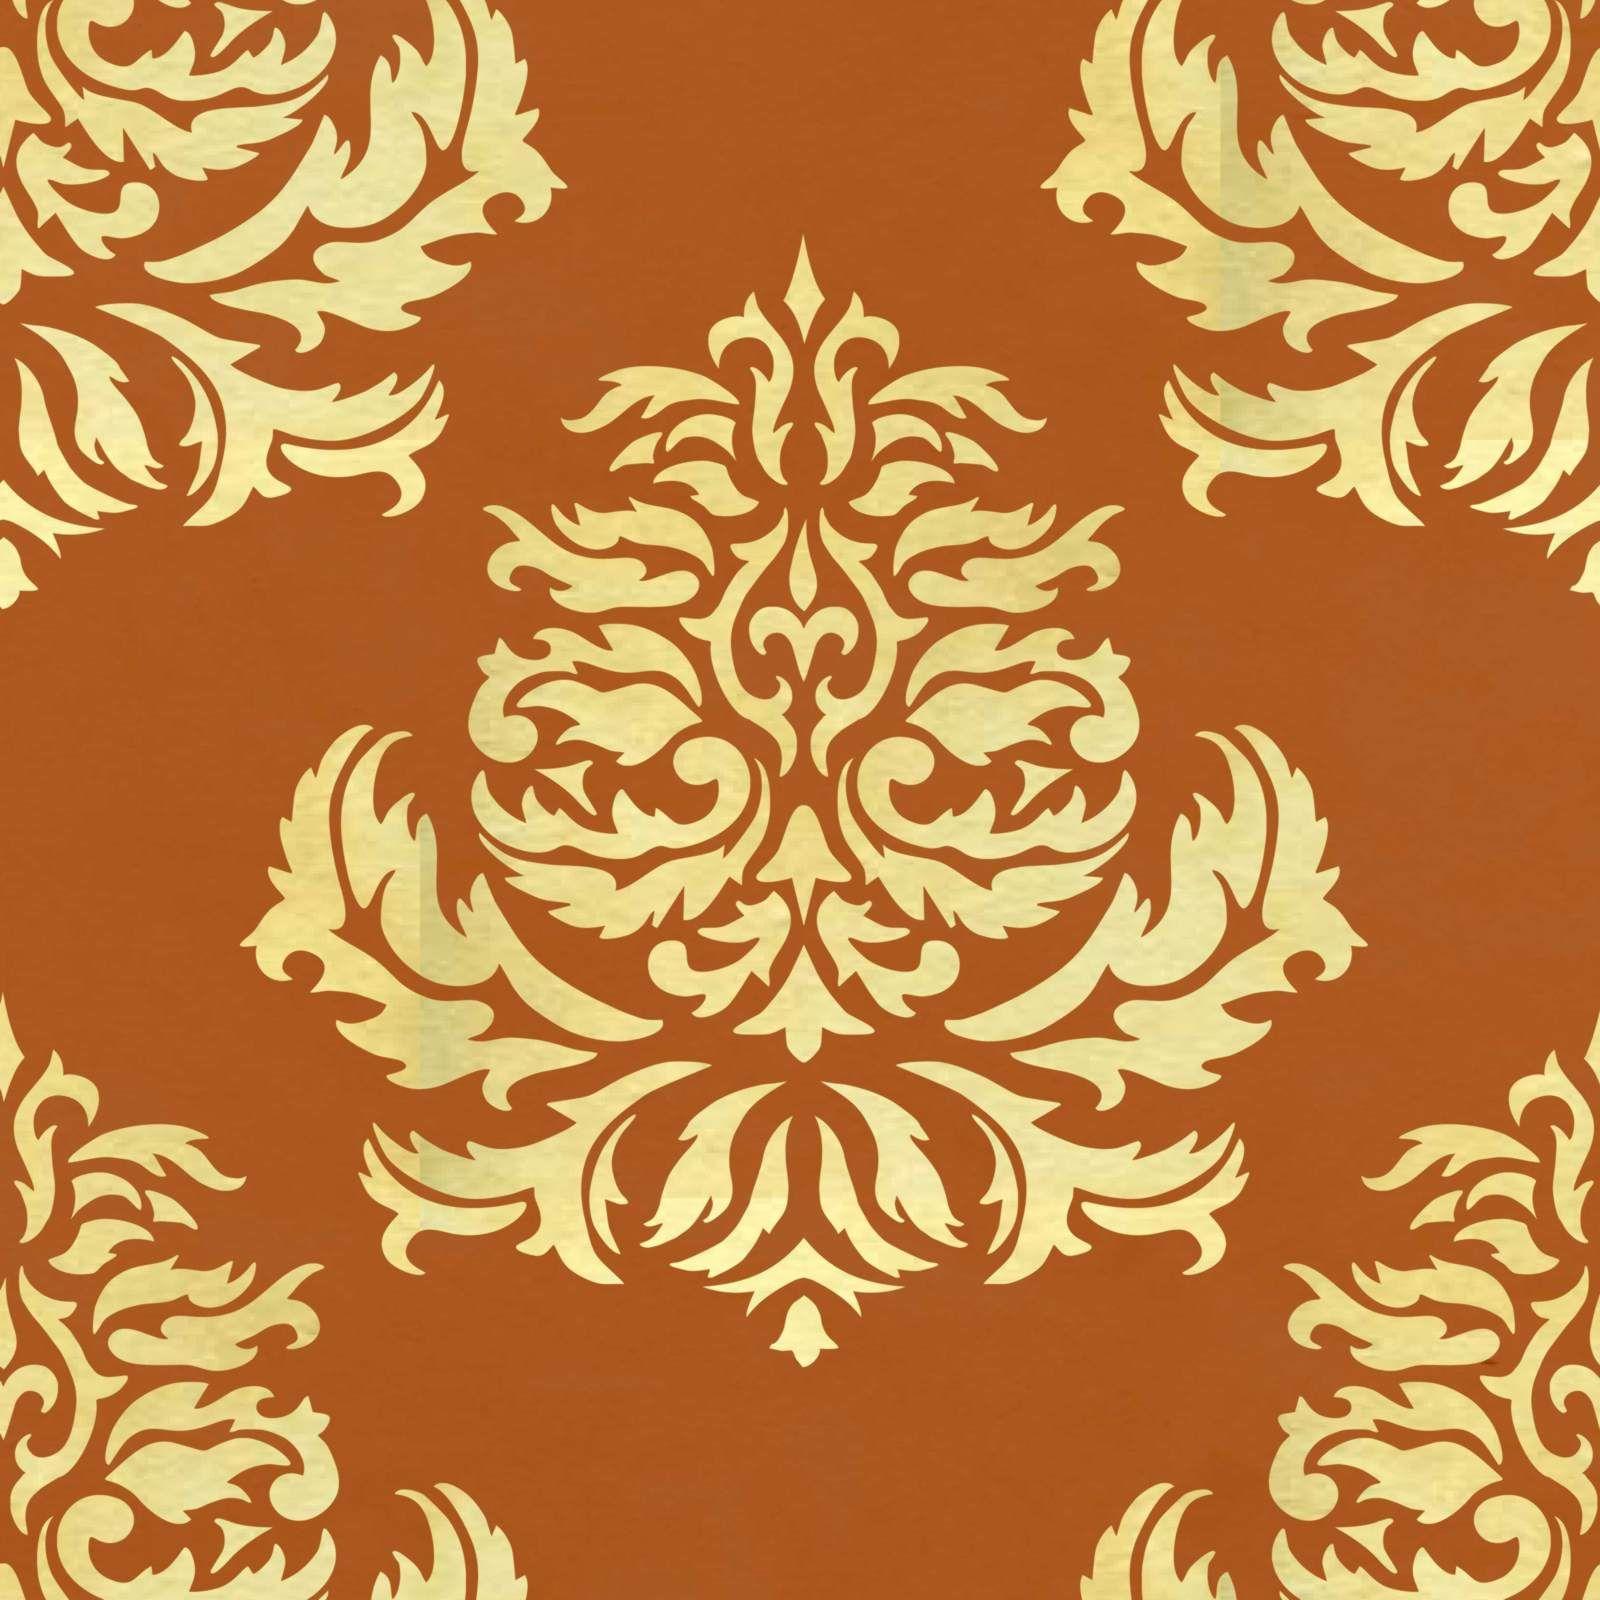 Classic Damask - Large Pattern Stencil Design 0153A | Print Patterns ...